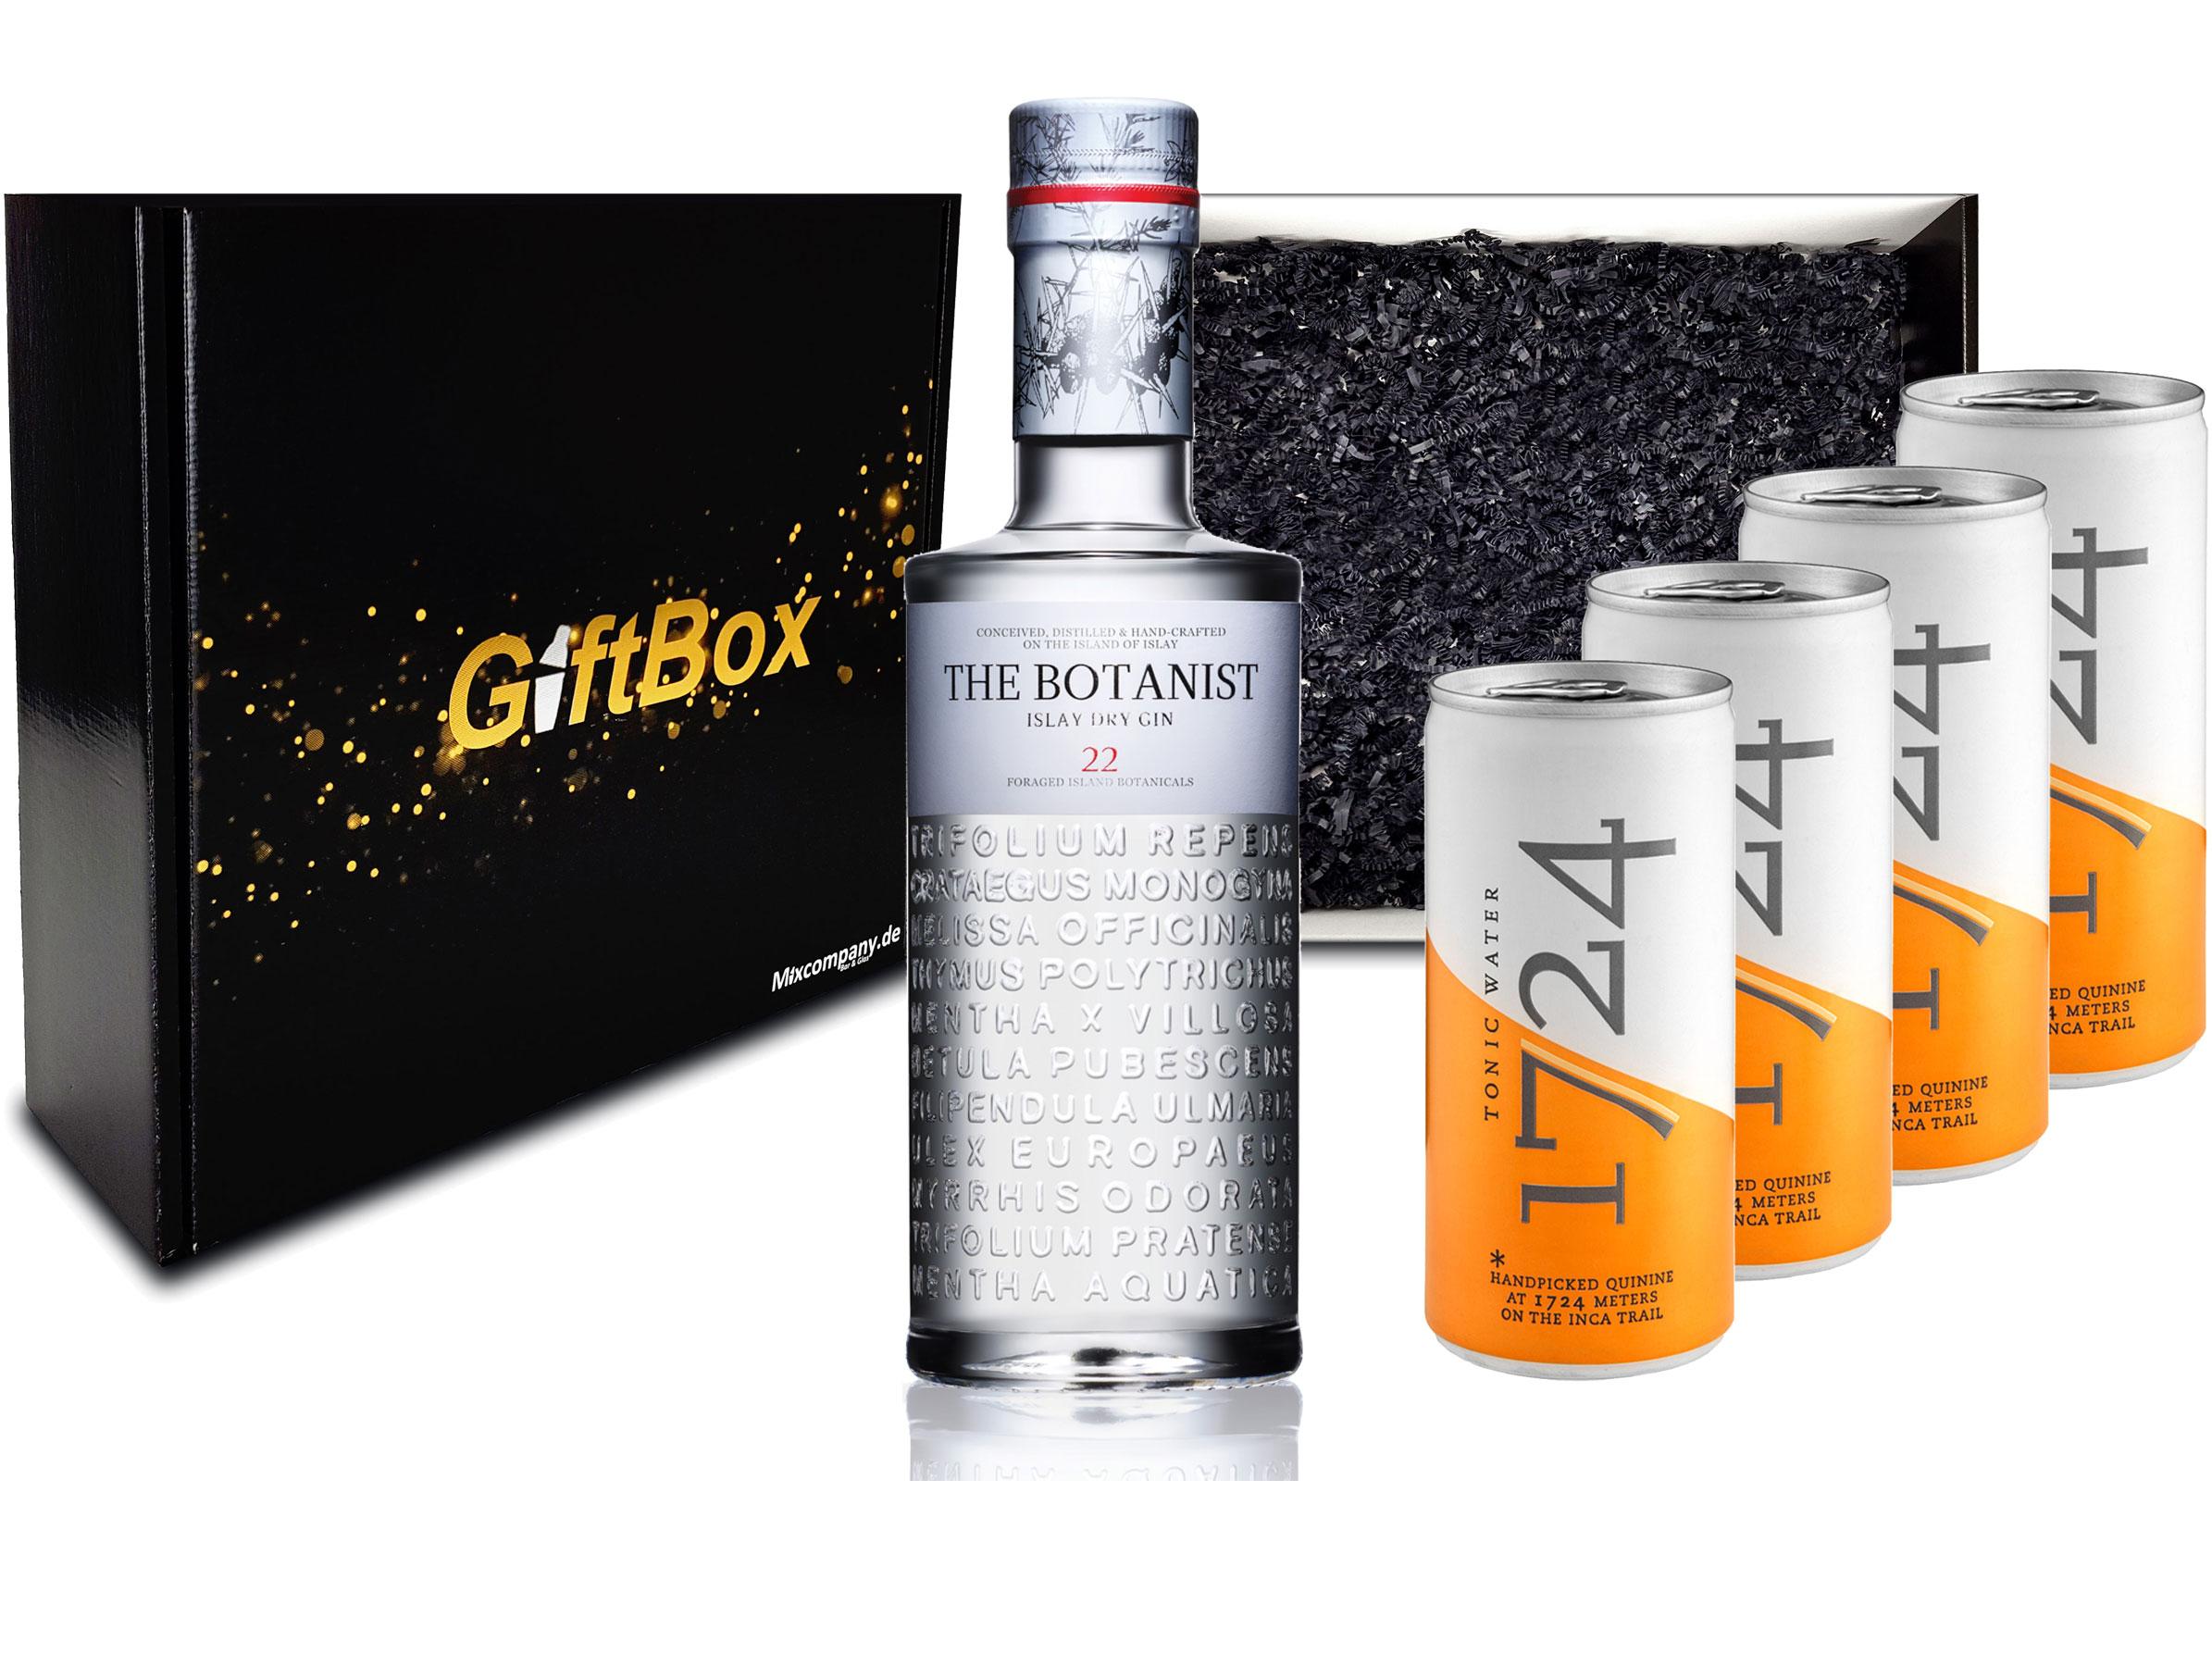 Gin Tonic Set Giftbox Geschenkset - The Botanist Islay Dry Gin 0,7l 700ml (46% Vol) + 4x 1724 Tonic Water Dose 200ml inkl. Pfand EINWEG -[Enthält Sulfite]